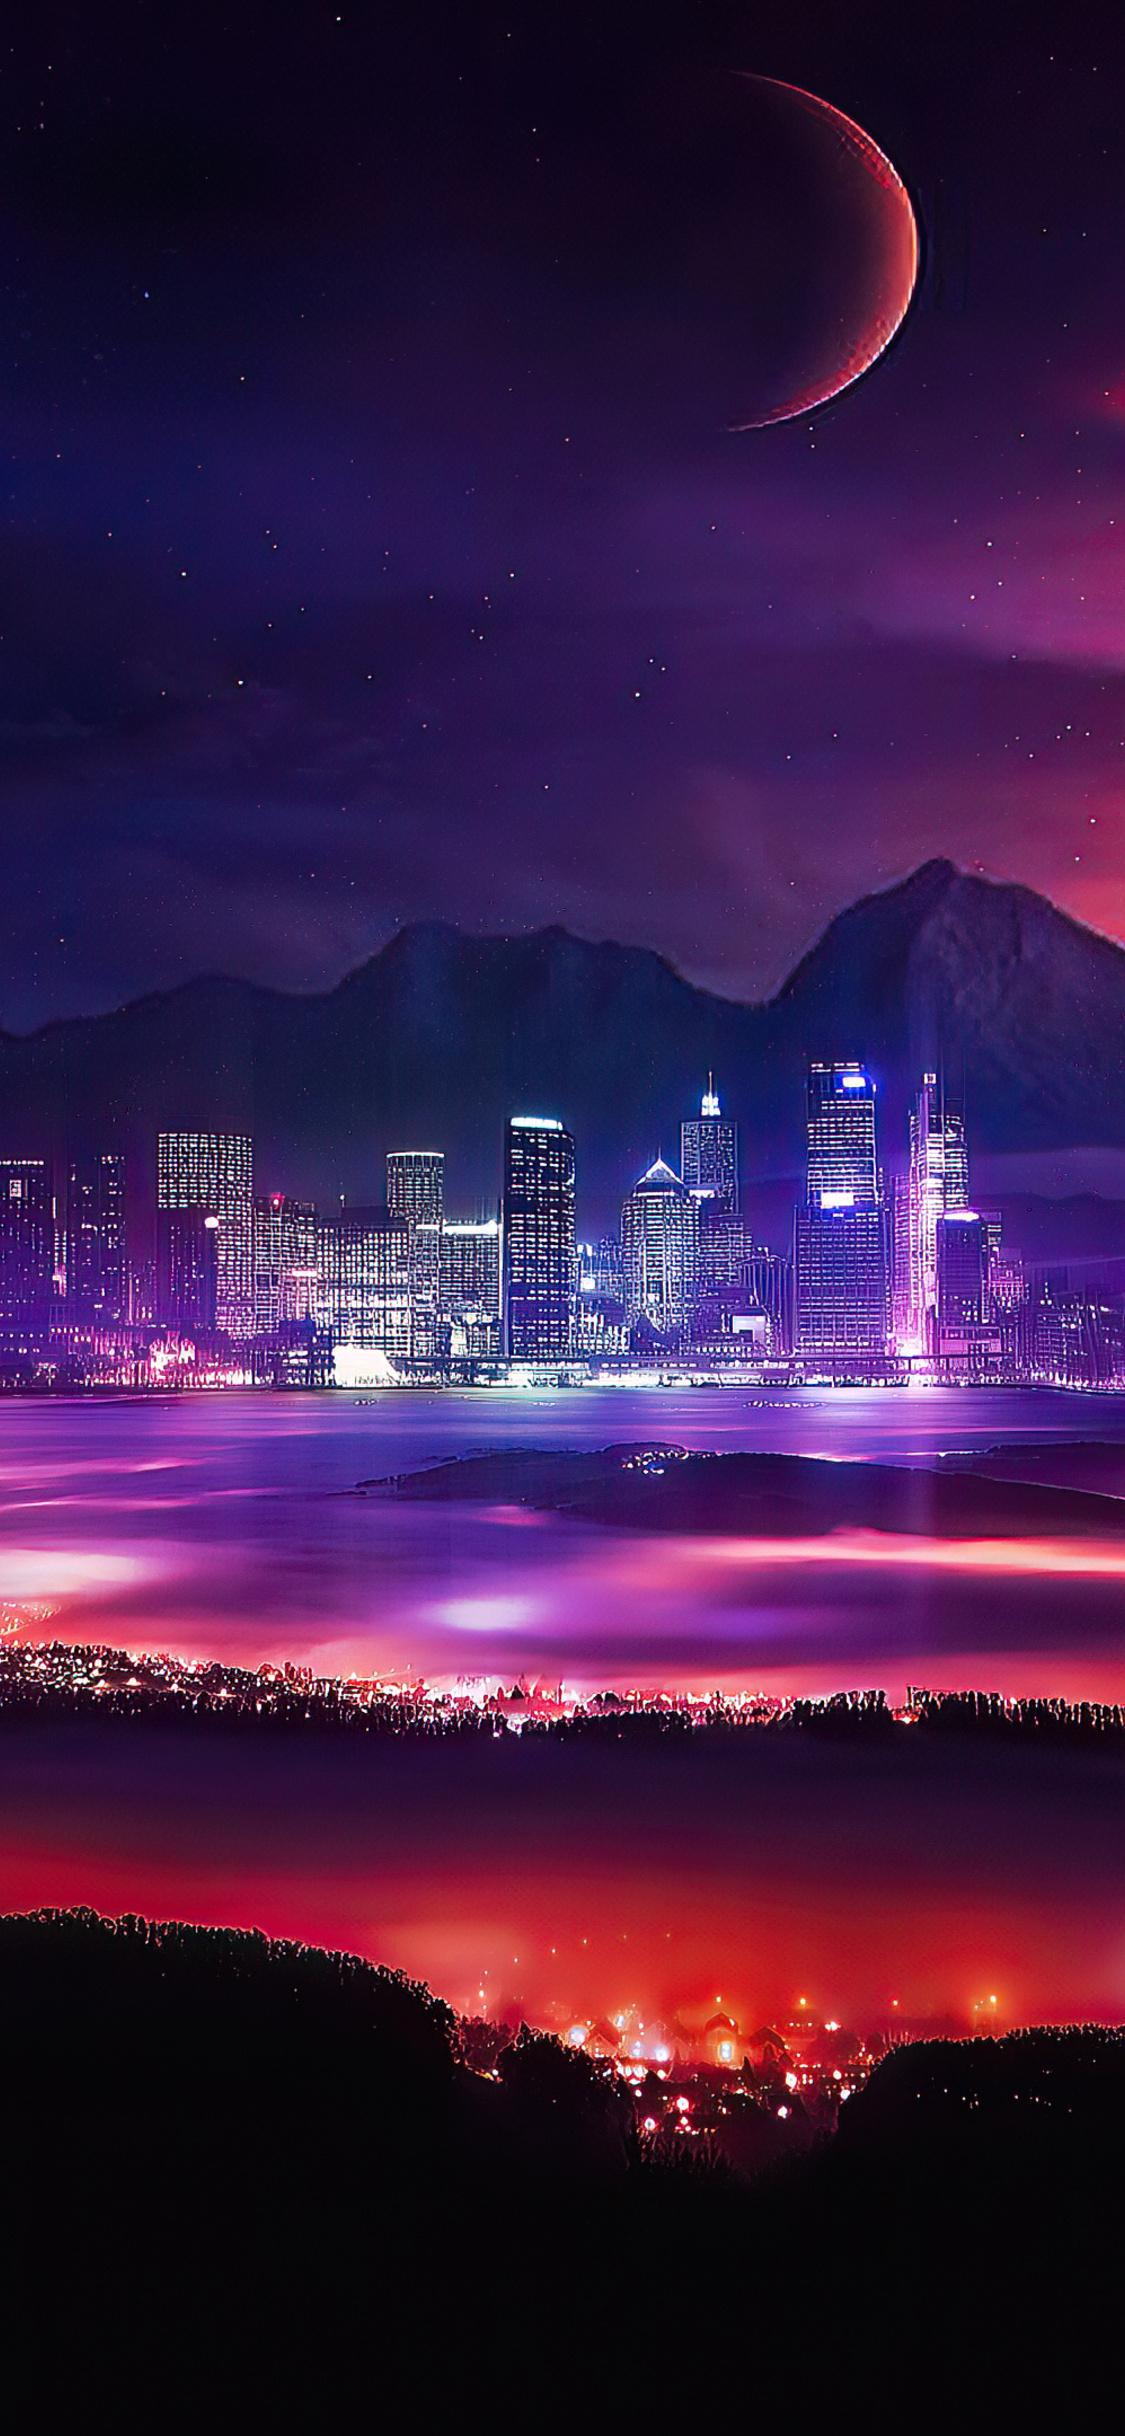 1125x2436 Night City Stars Planets Moon Manipulation ...